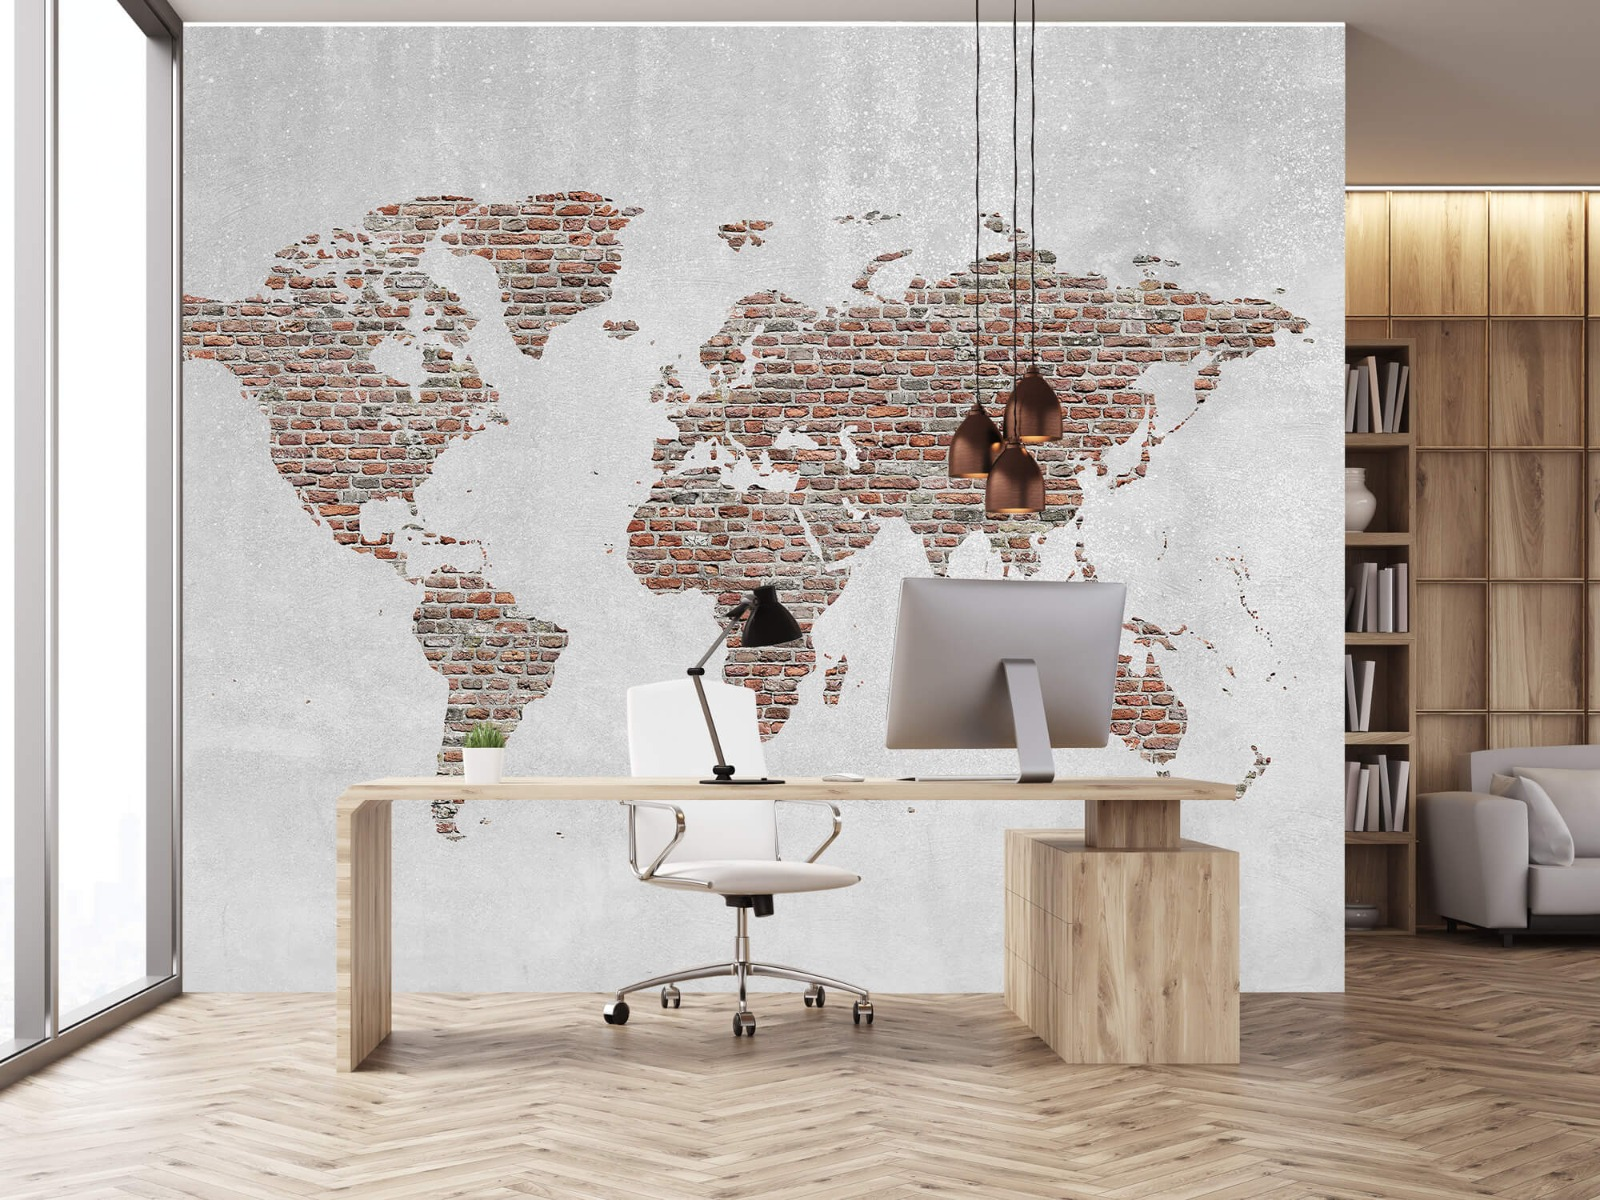 Steen behang - Wereldkaart stenen - Slaapkamer 24